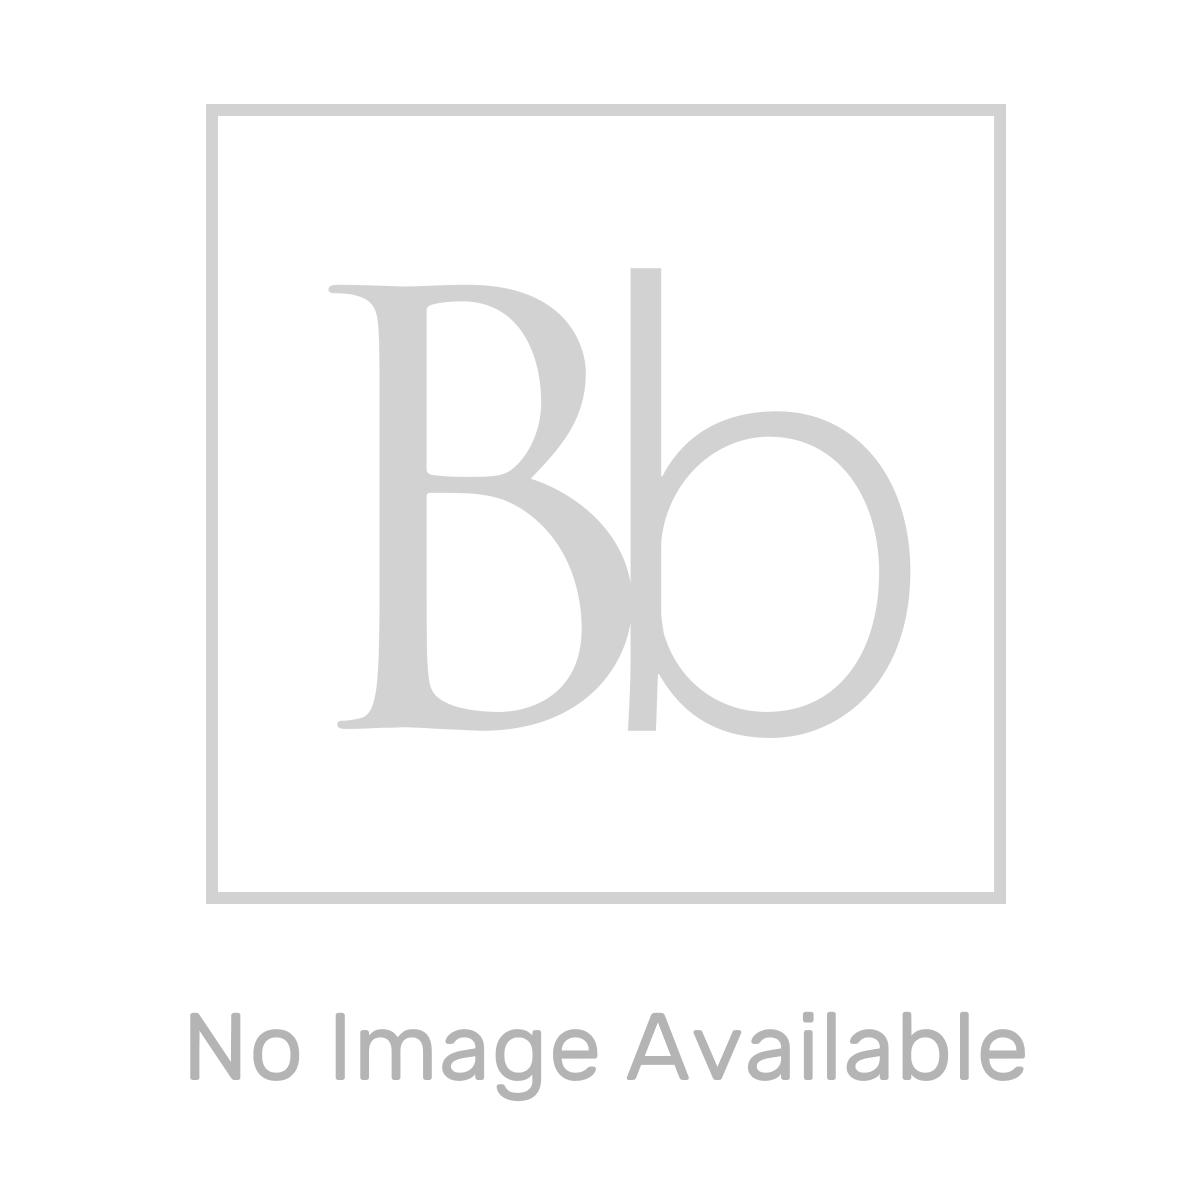 RAK Washington Cappucino Vanity Unit with Black Countertop 600mm Measurements